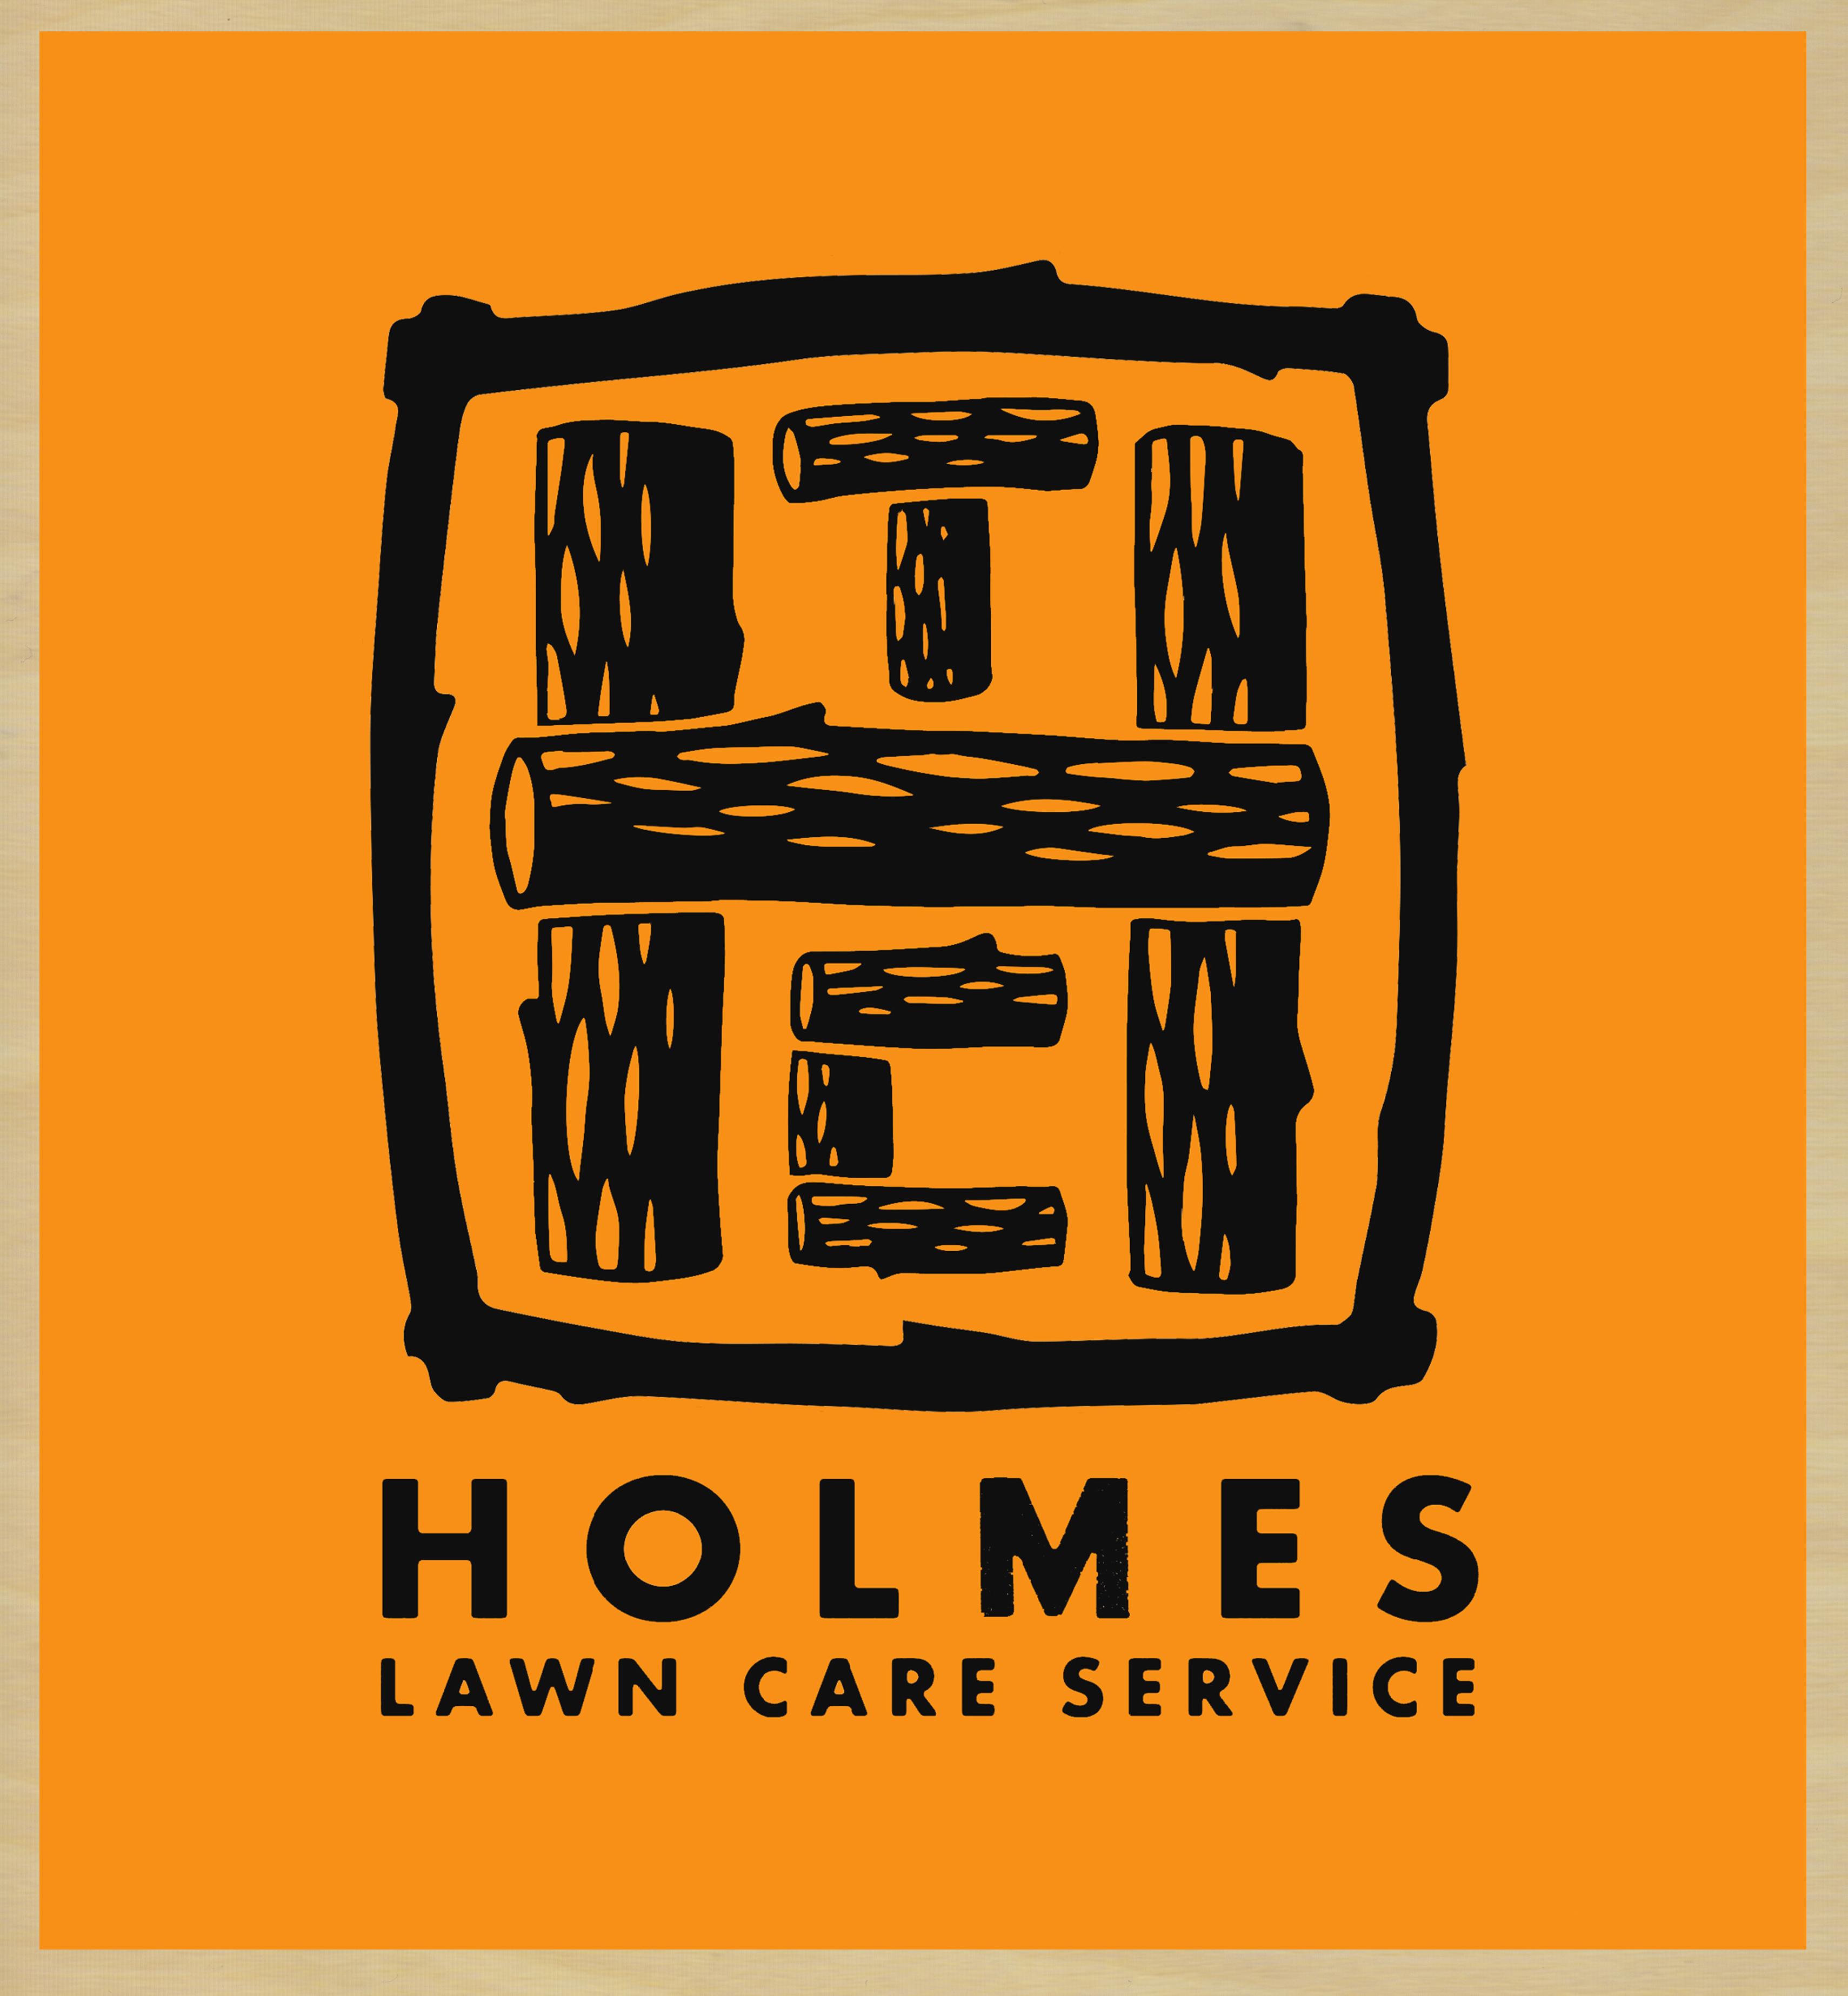 T.C. Holmes